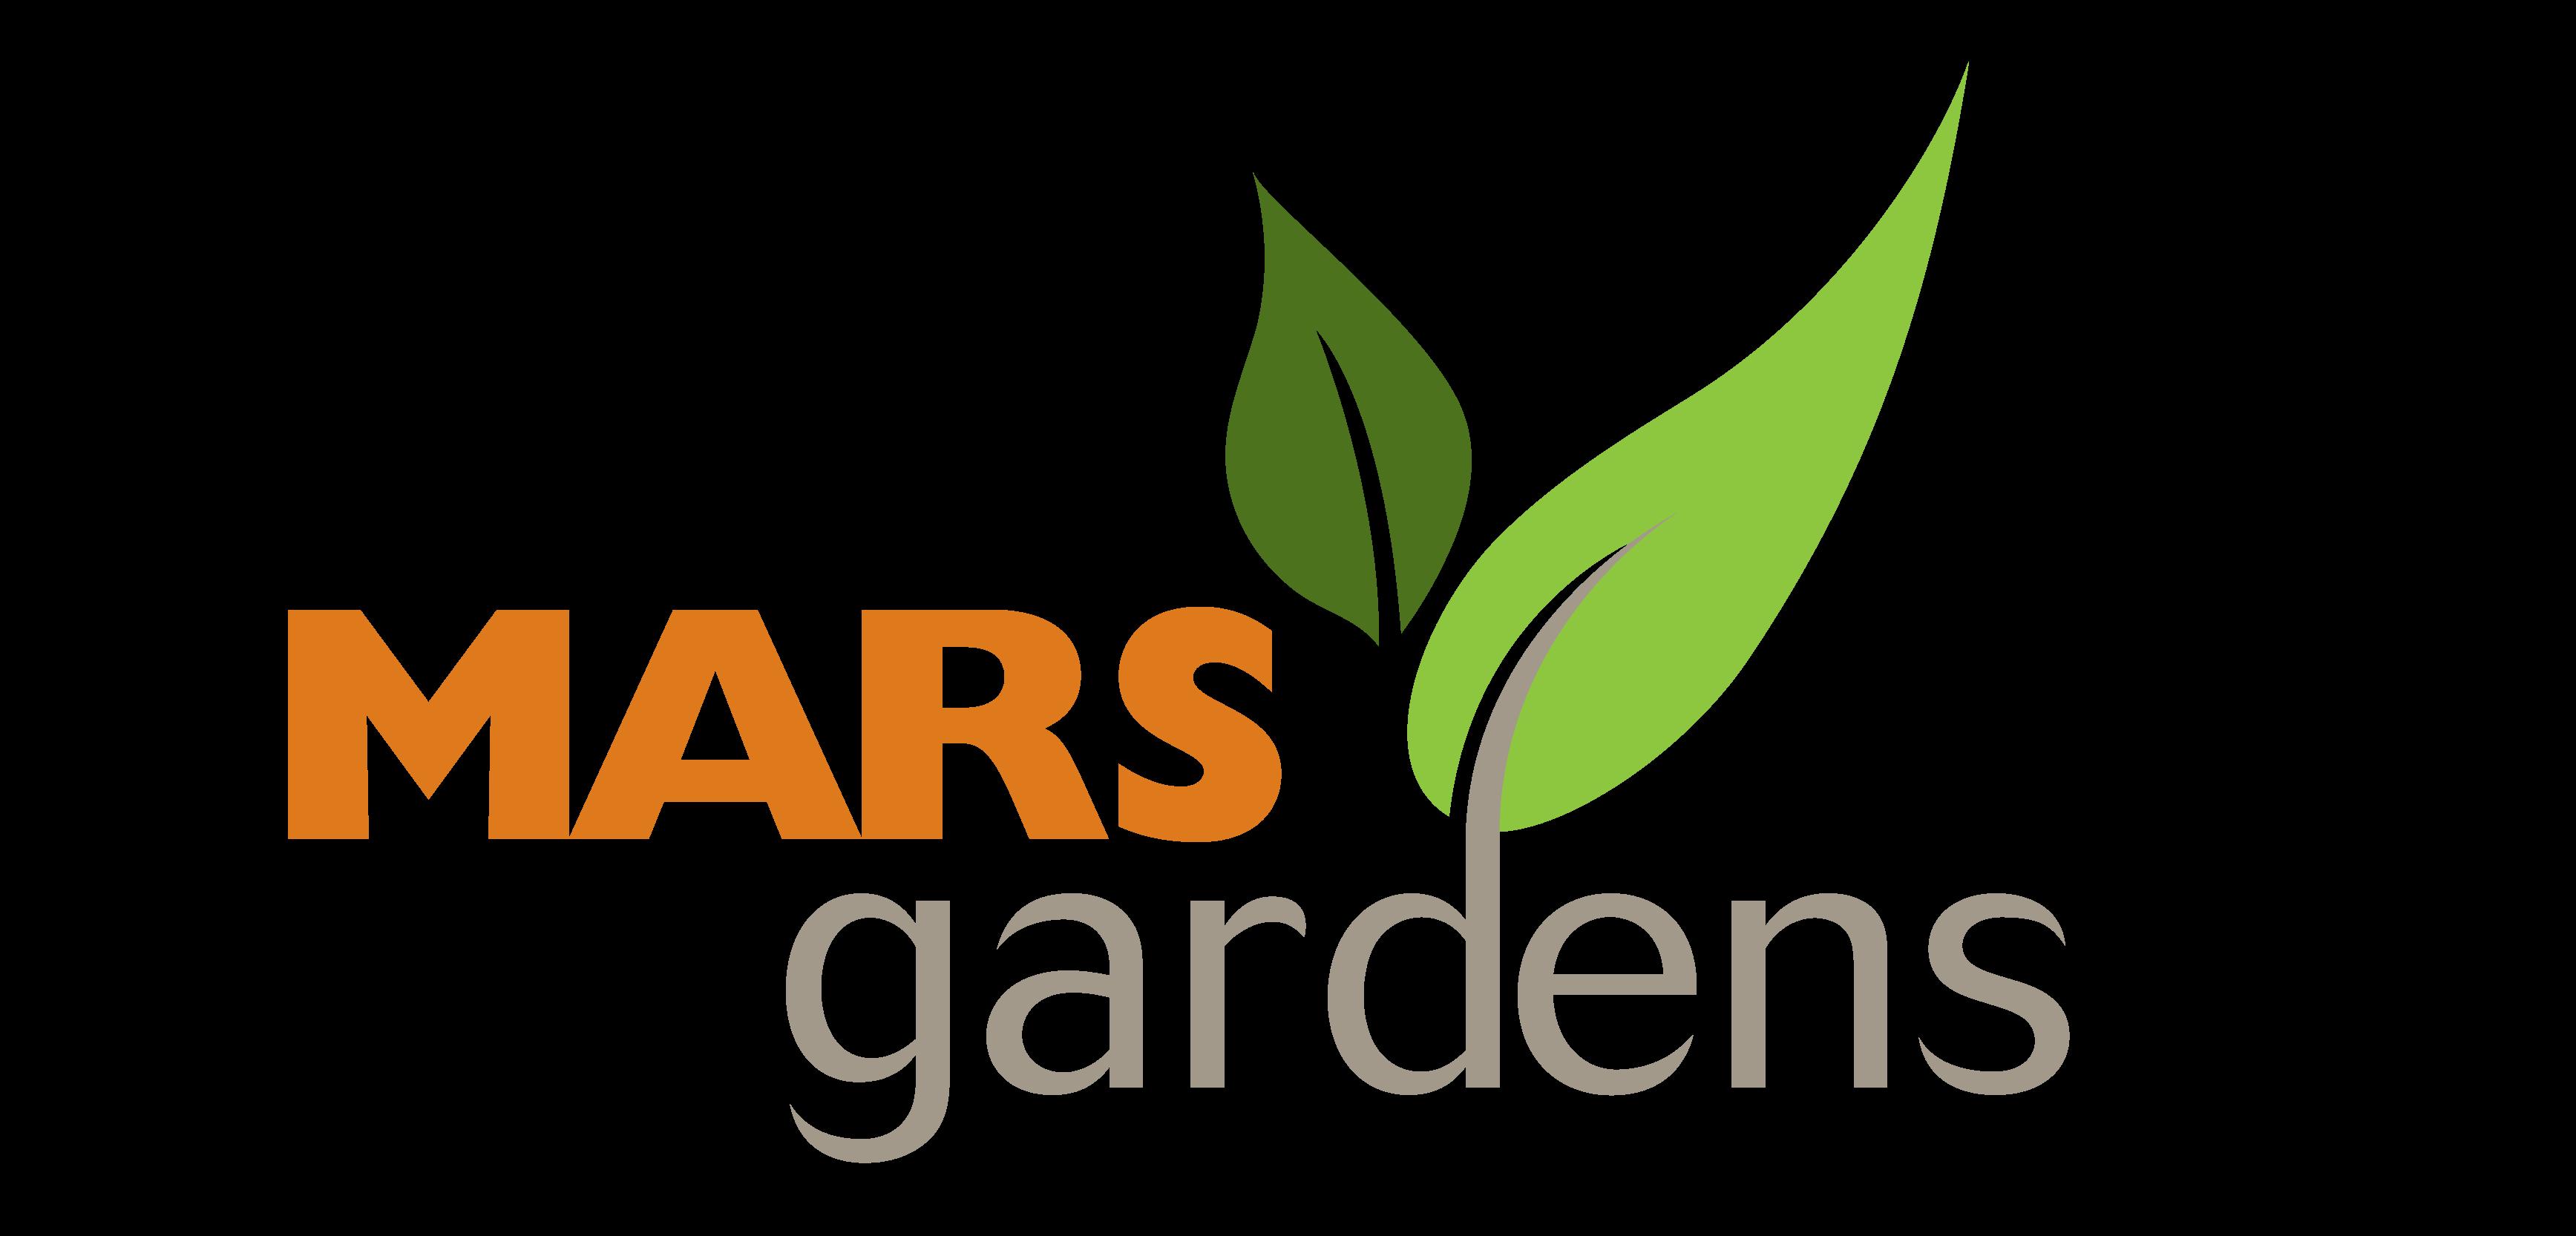 Mars Gardens